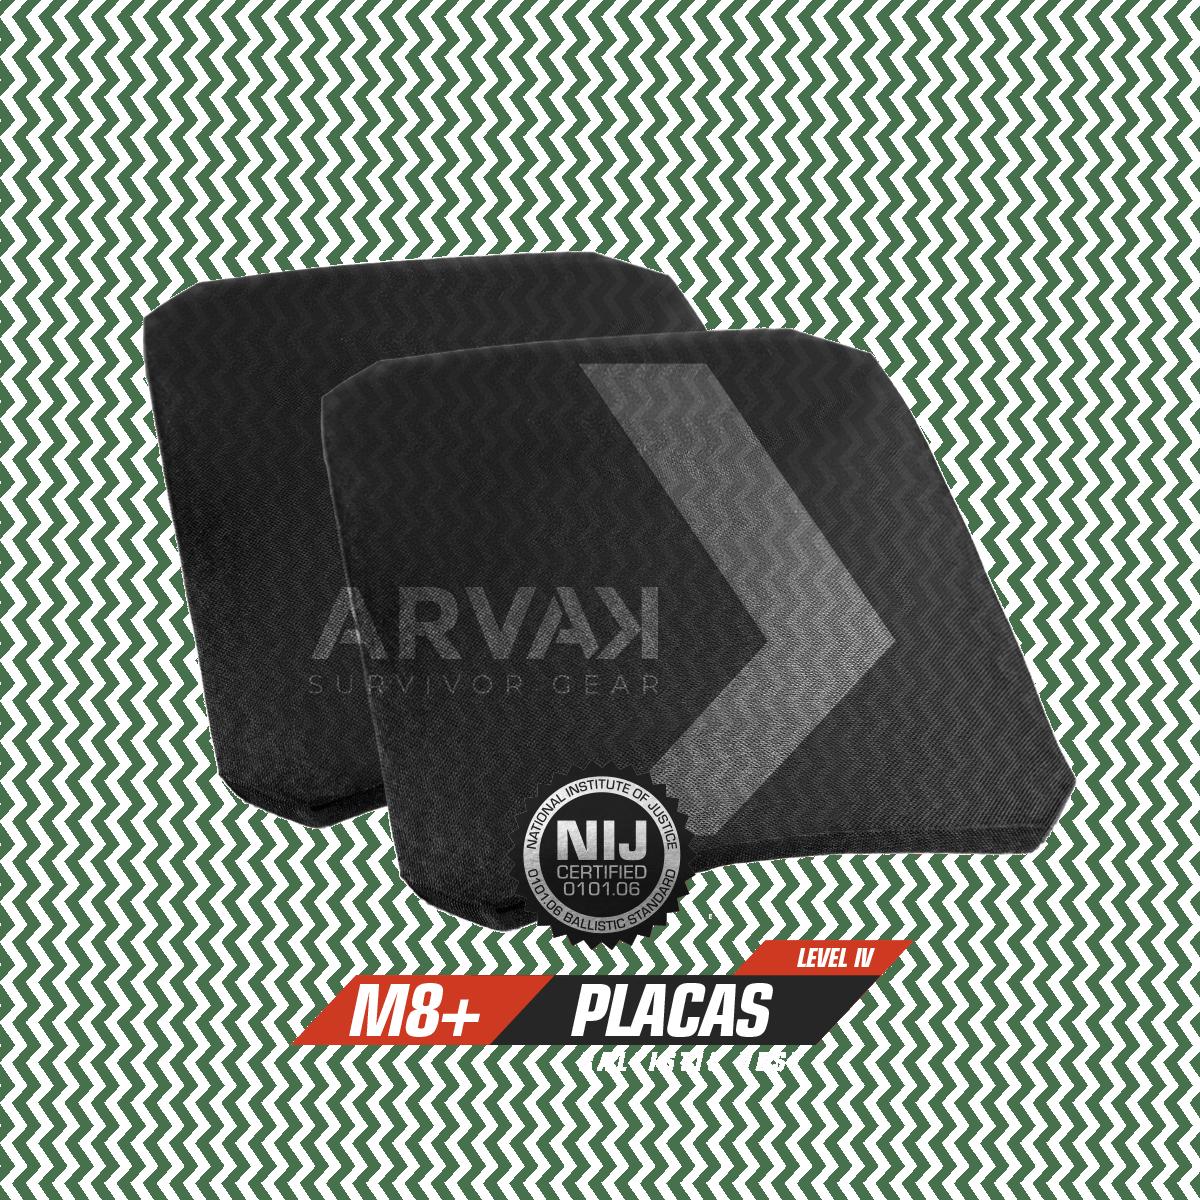 Accesorio M8+ Arvak Tactical